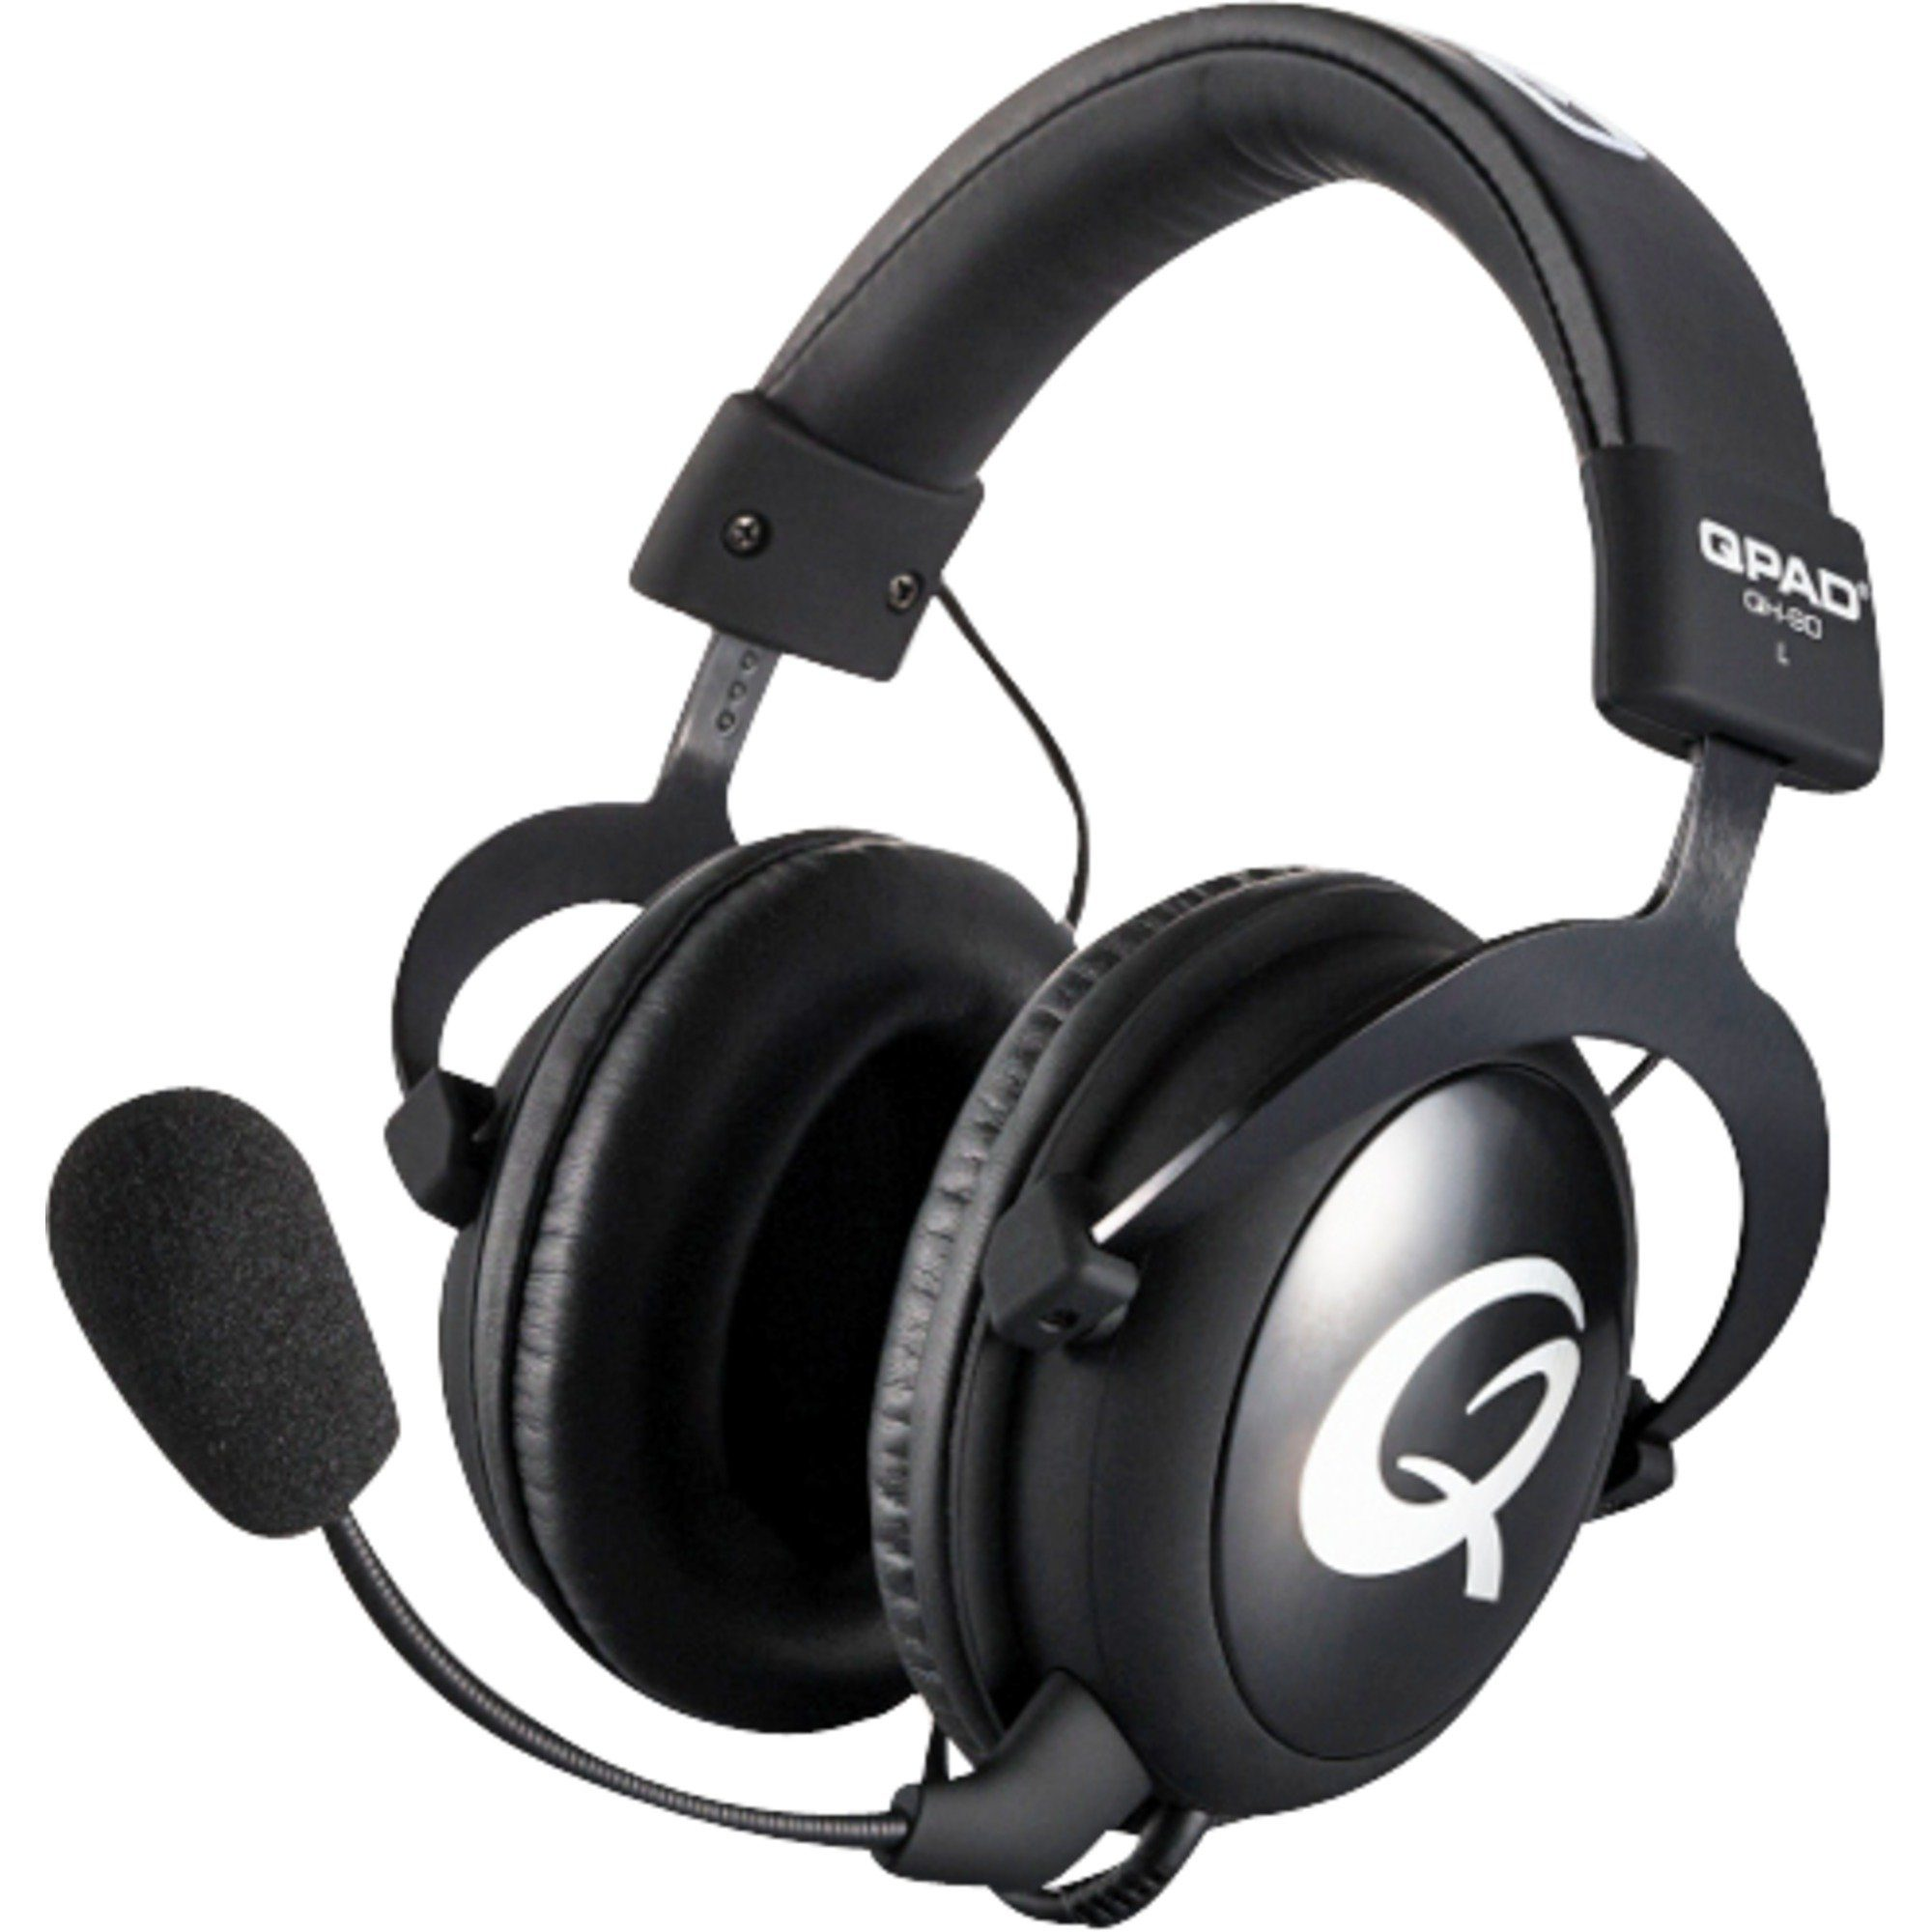 QPAD Headset »QH-90 Pro Gaming Headset«